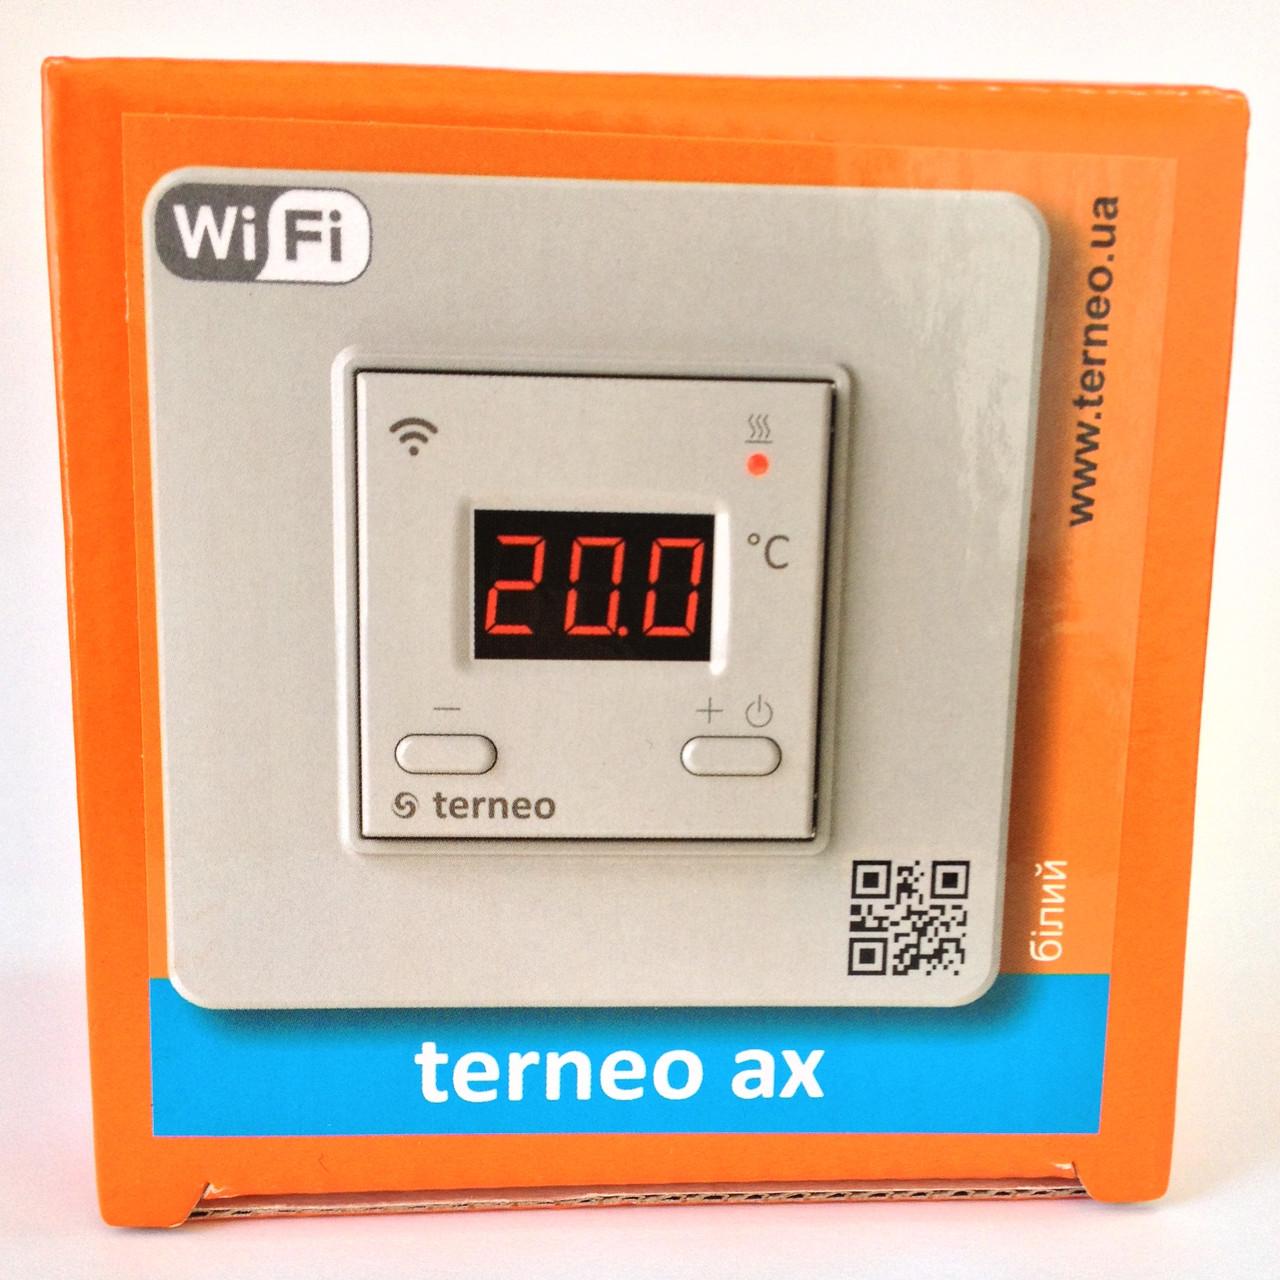 Wi-Fi терморегулятор terneo ax - ЭКО ТЕПЛИЦА в Киеве